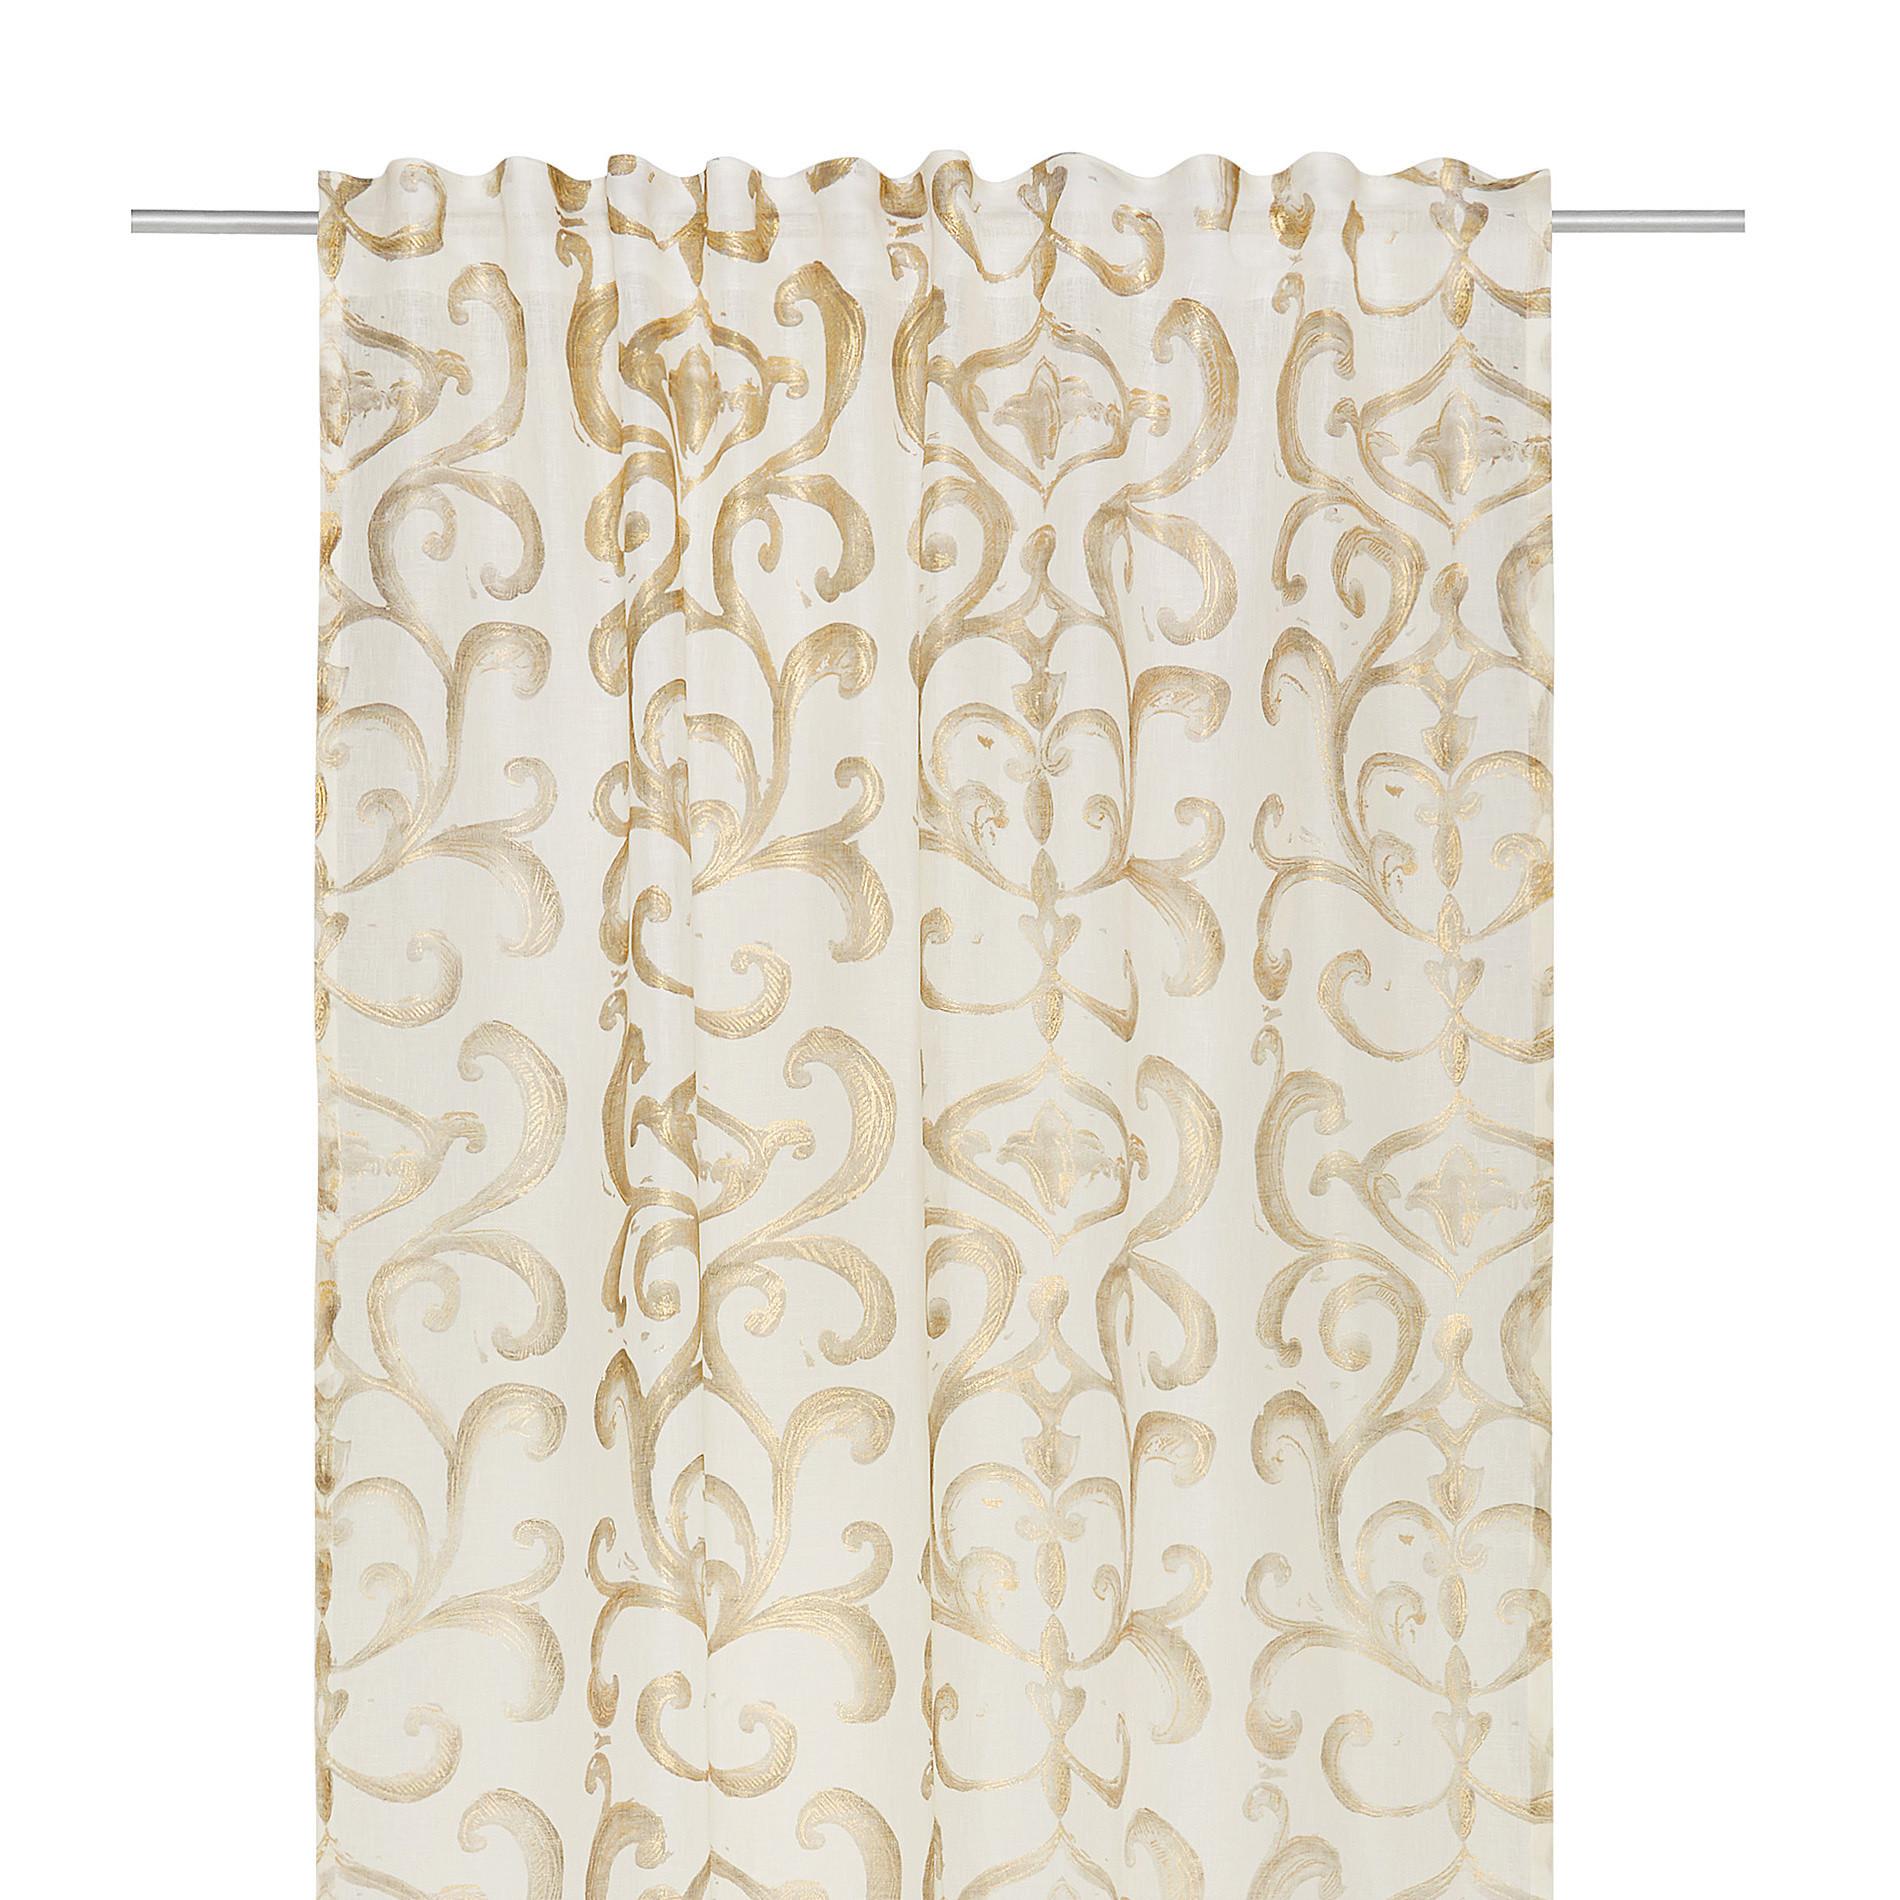 Tenda puro lino stampa devore, Bianco/Oro, large image number 2